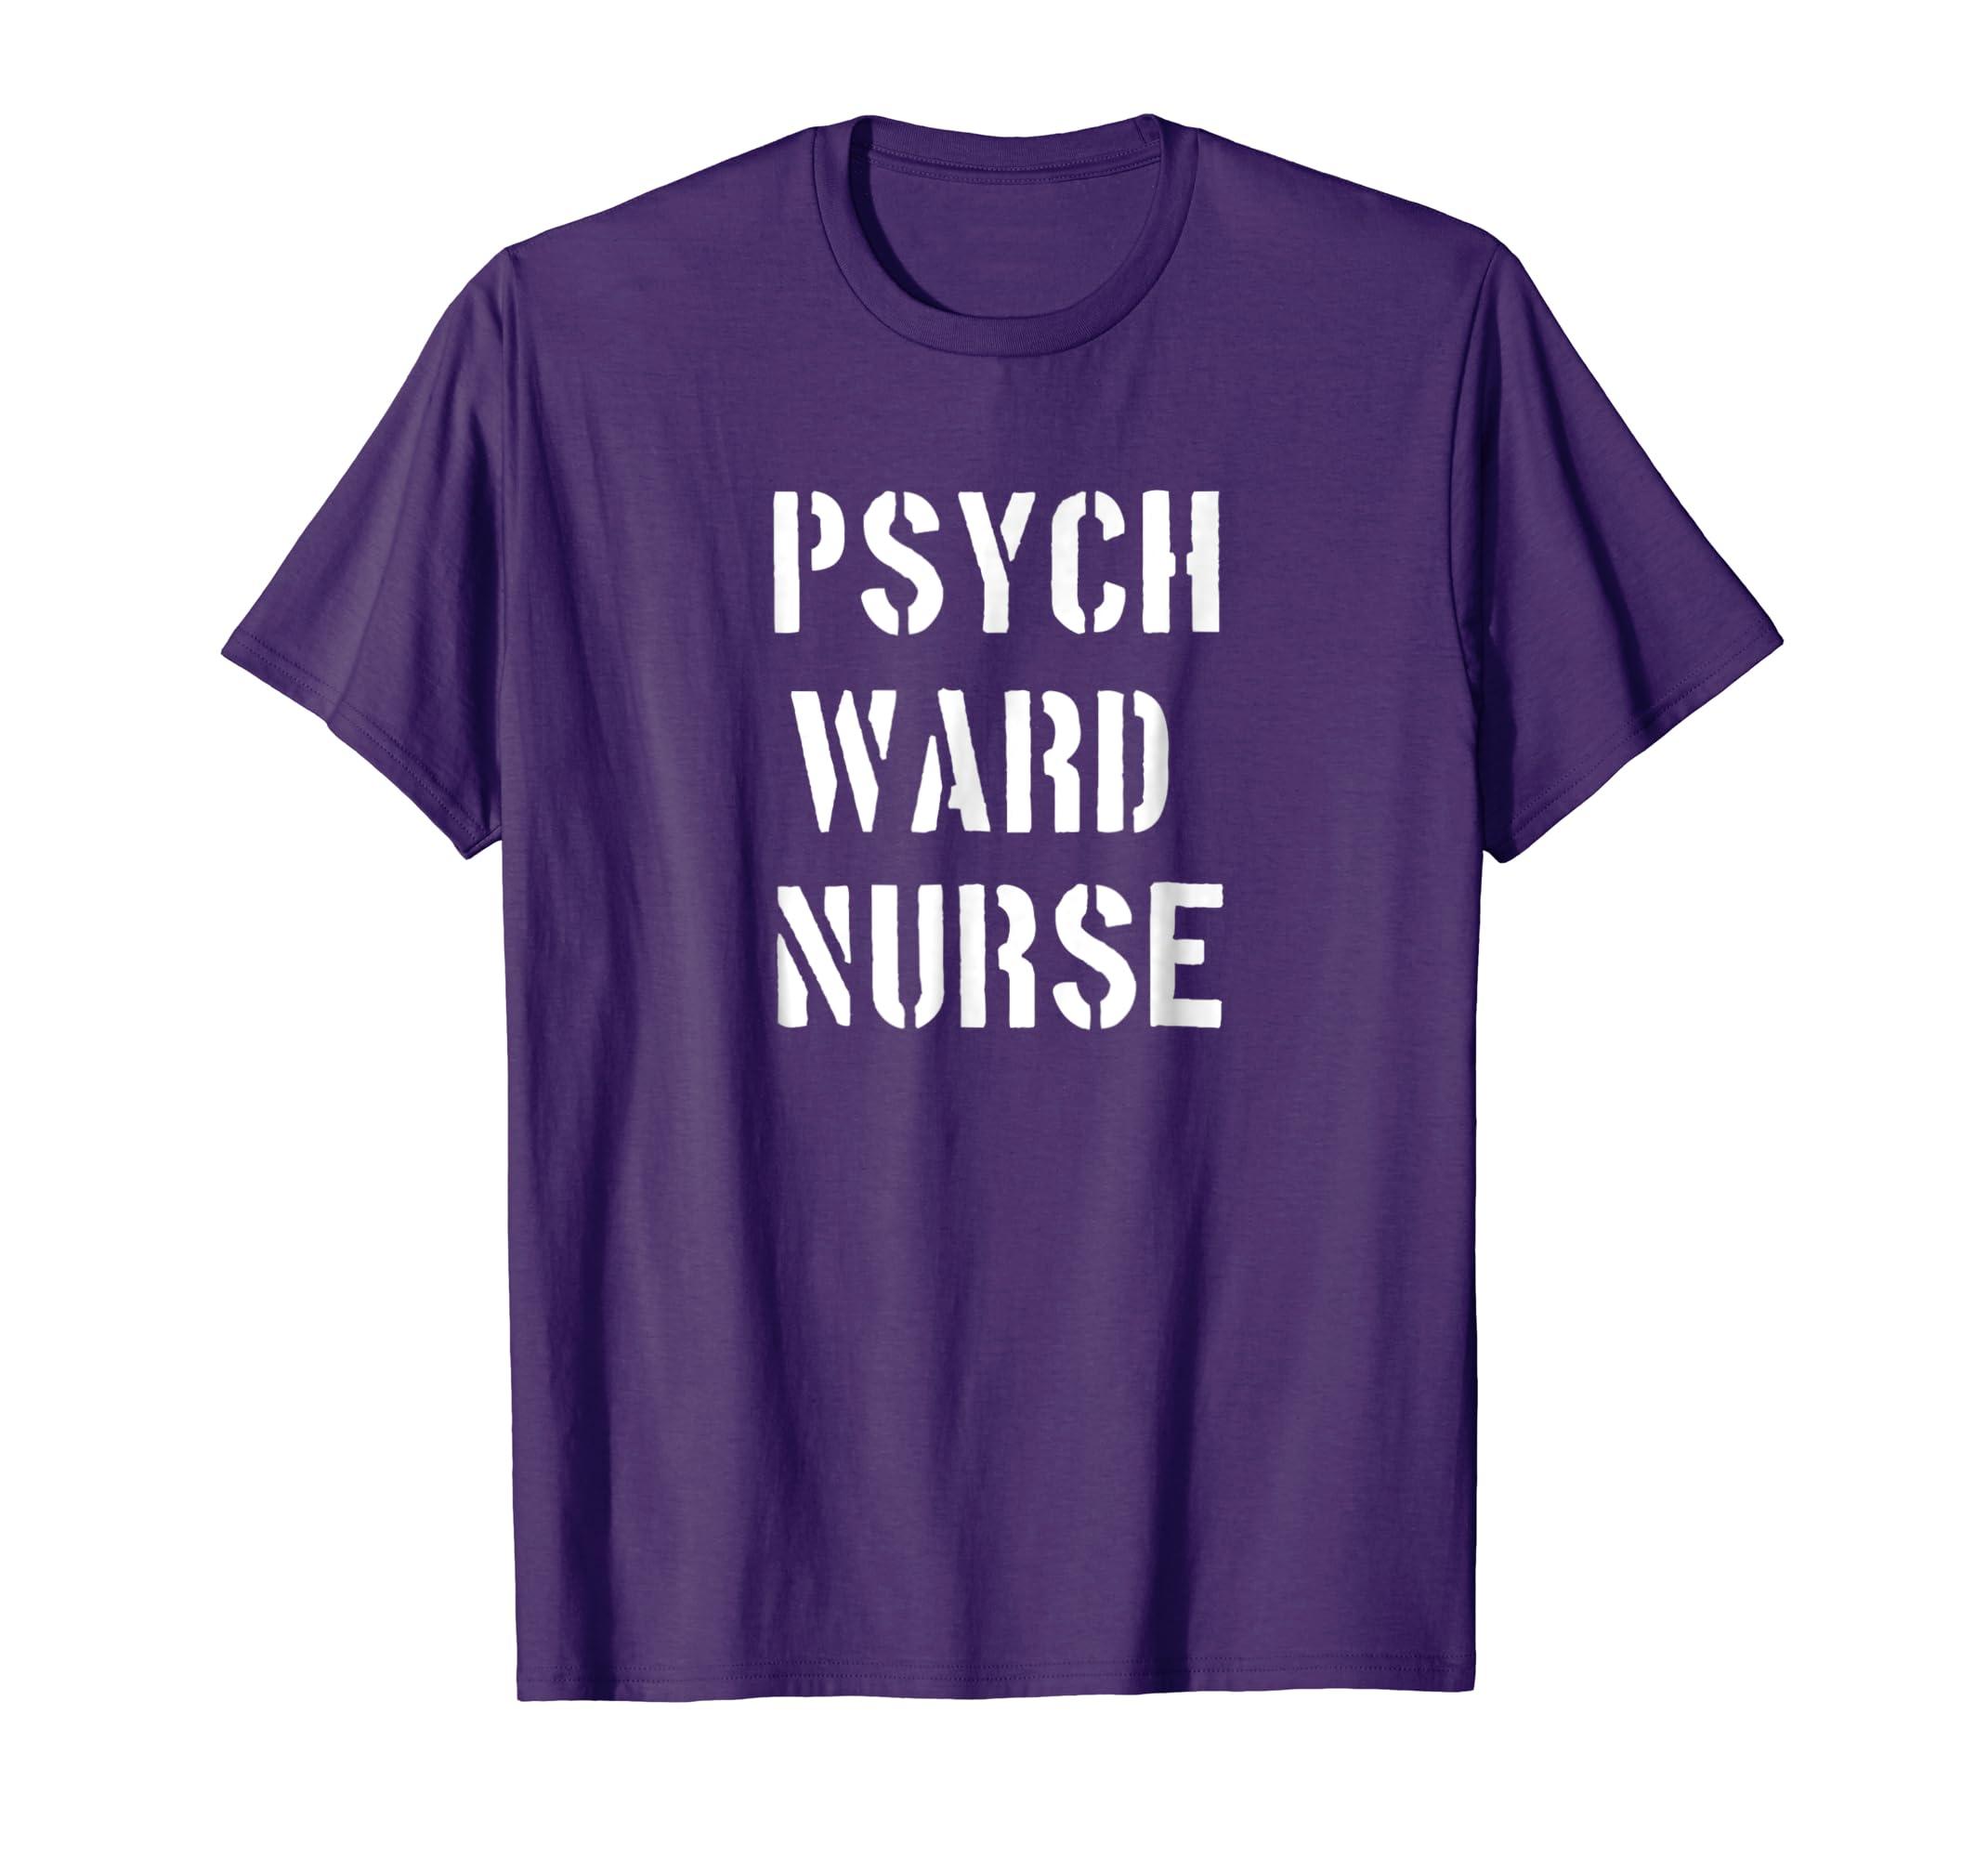 Psych Ward Nurse Costume Halloween Shirt-Teechatpro